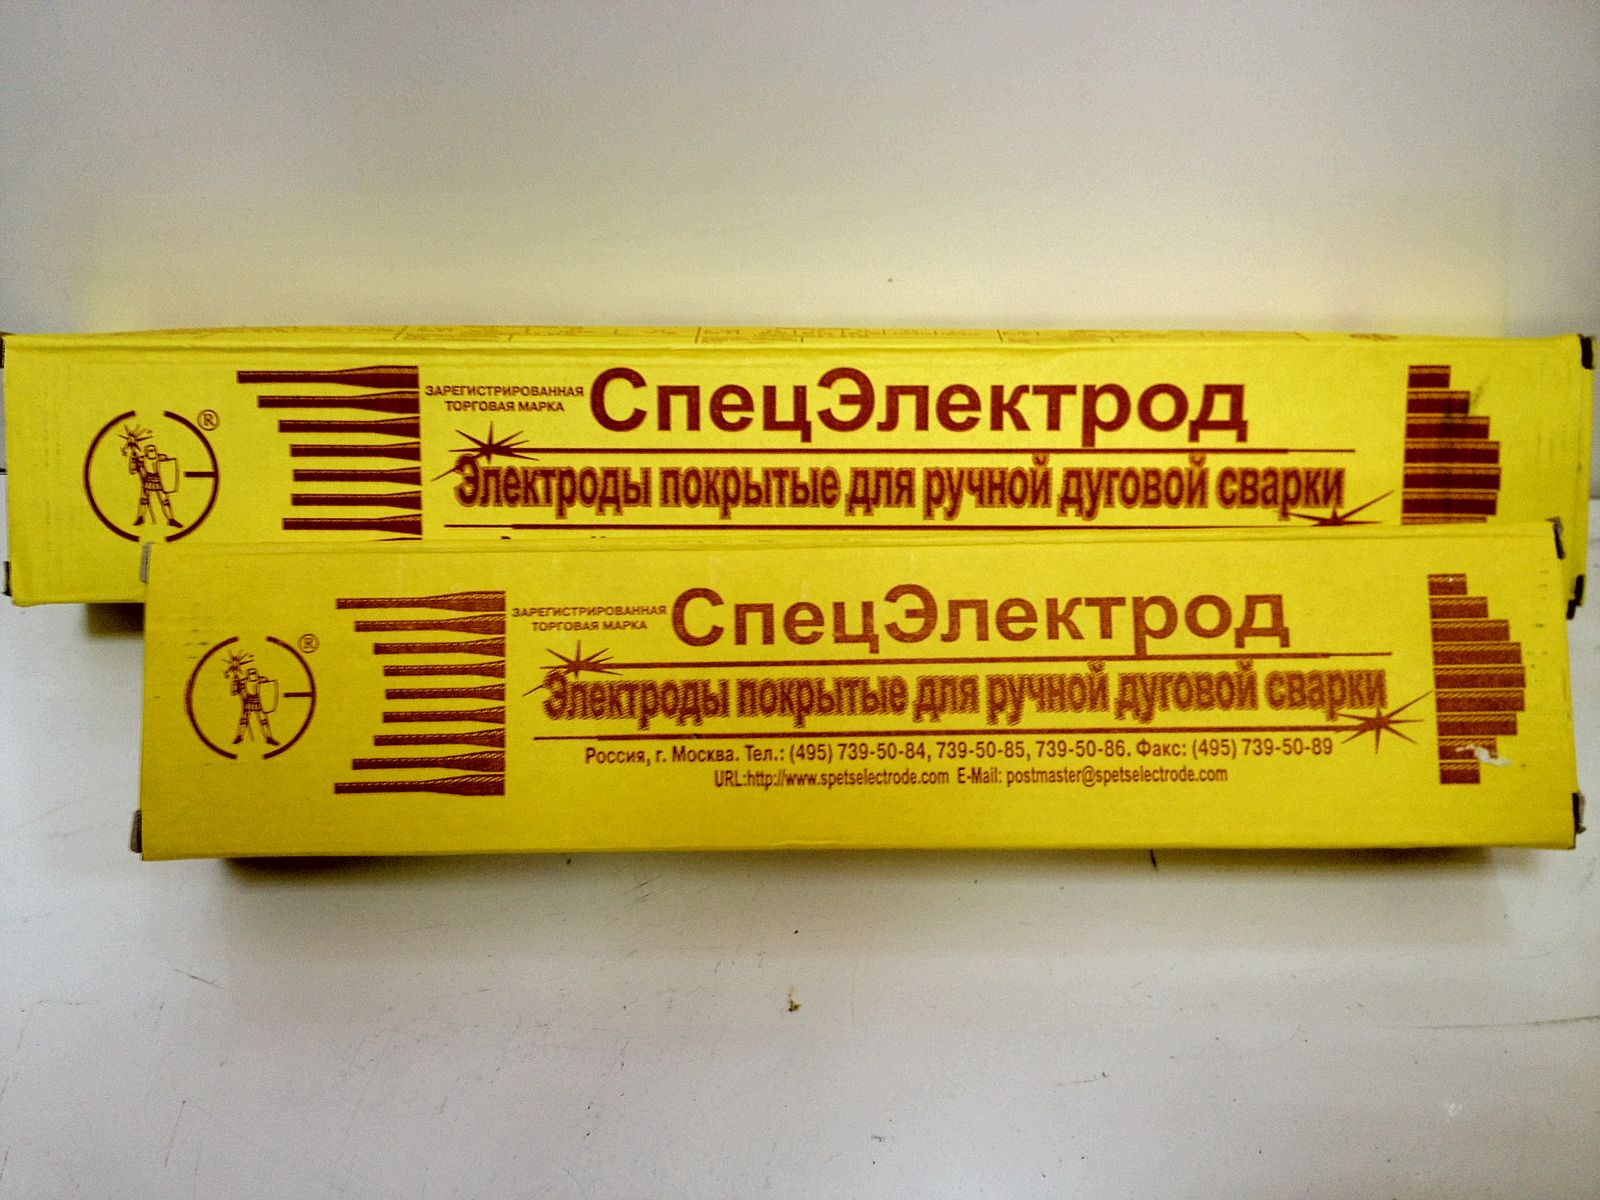 МР-3 (производитель СпецЭлектрод, d мм: 4-5)